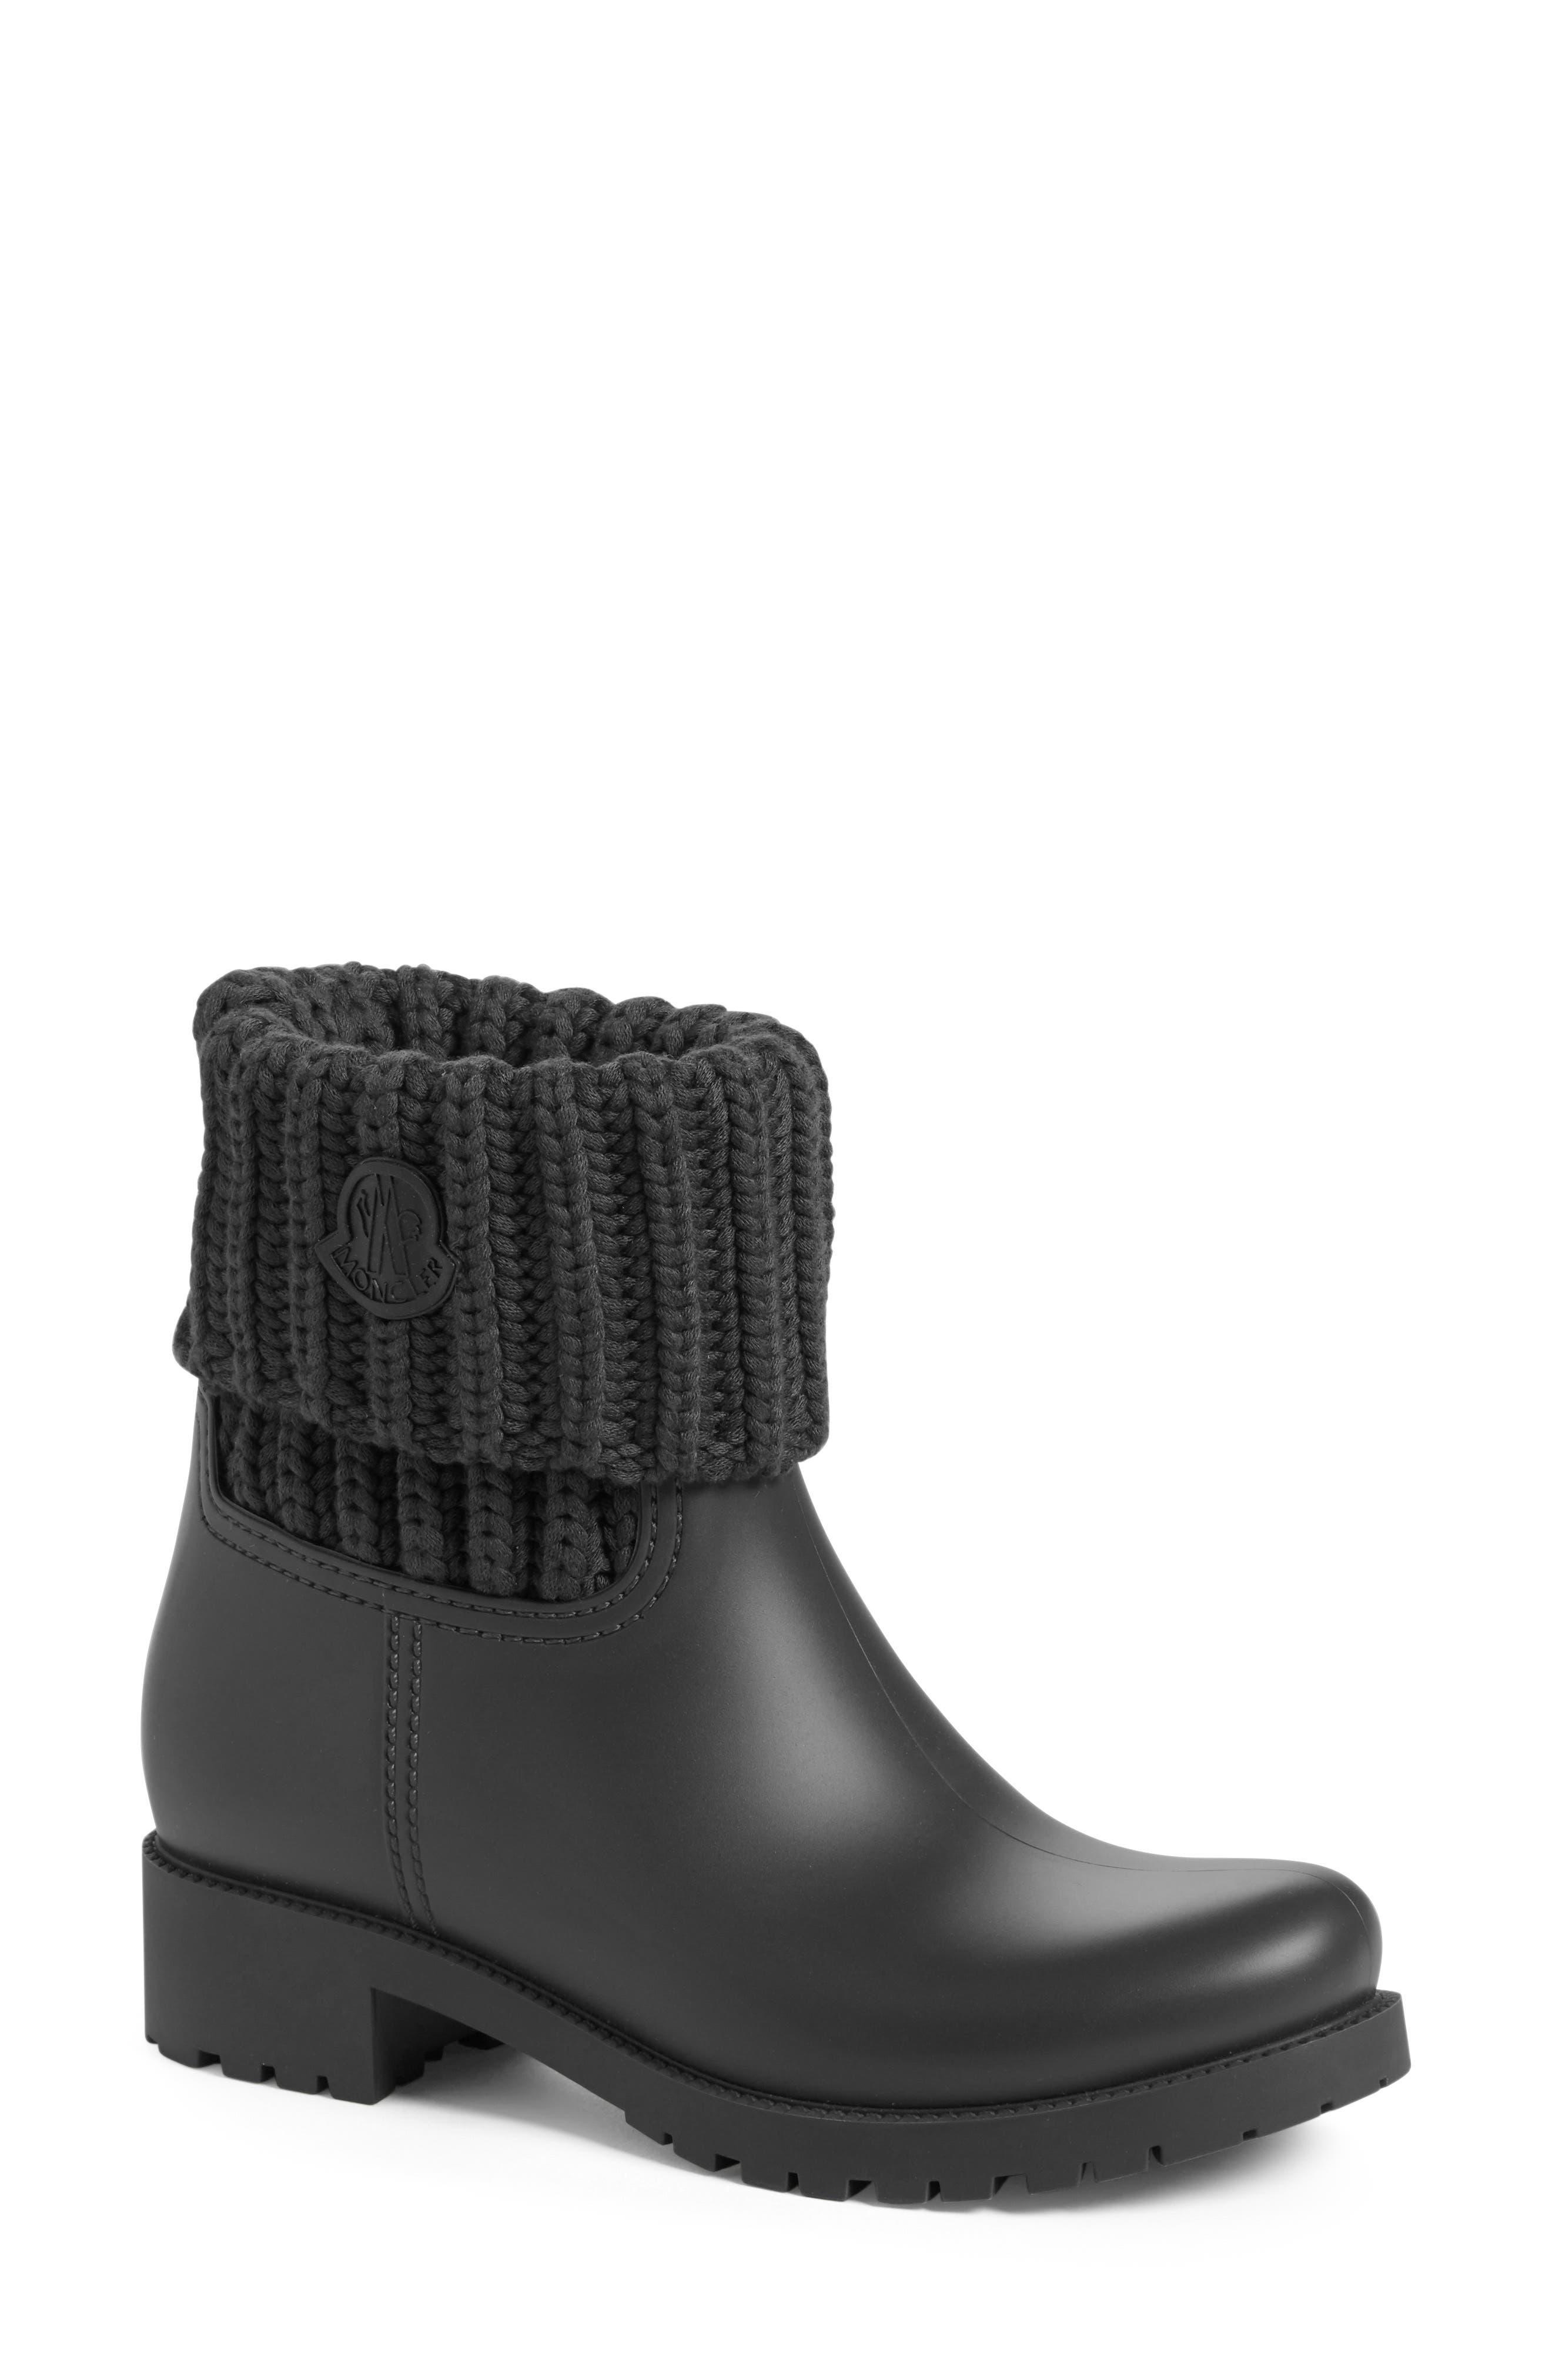 Moncler 'Ginette' Knit Cuff Leather Rain Boot (Women)